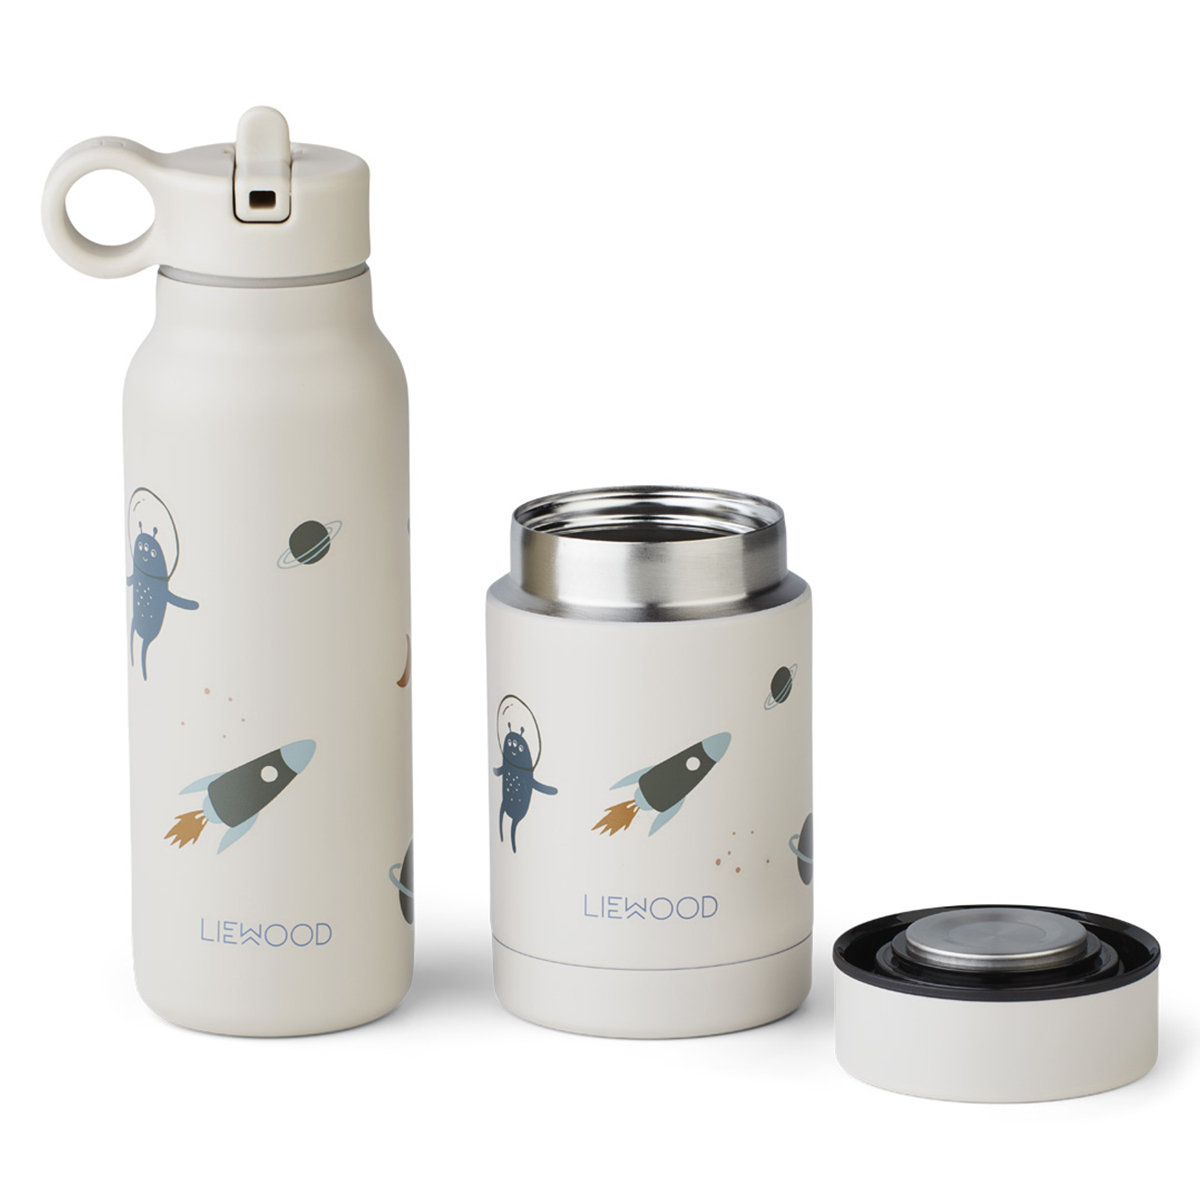 Tasse & Verre Pack Pique-nique Marlow - Space Sandy Mix Pack Pique-nique Marlow - Space Sandy Mix